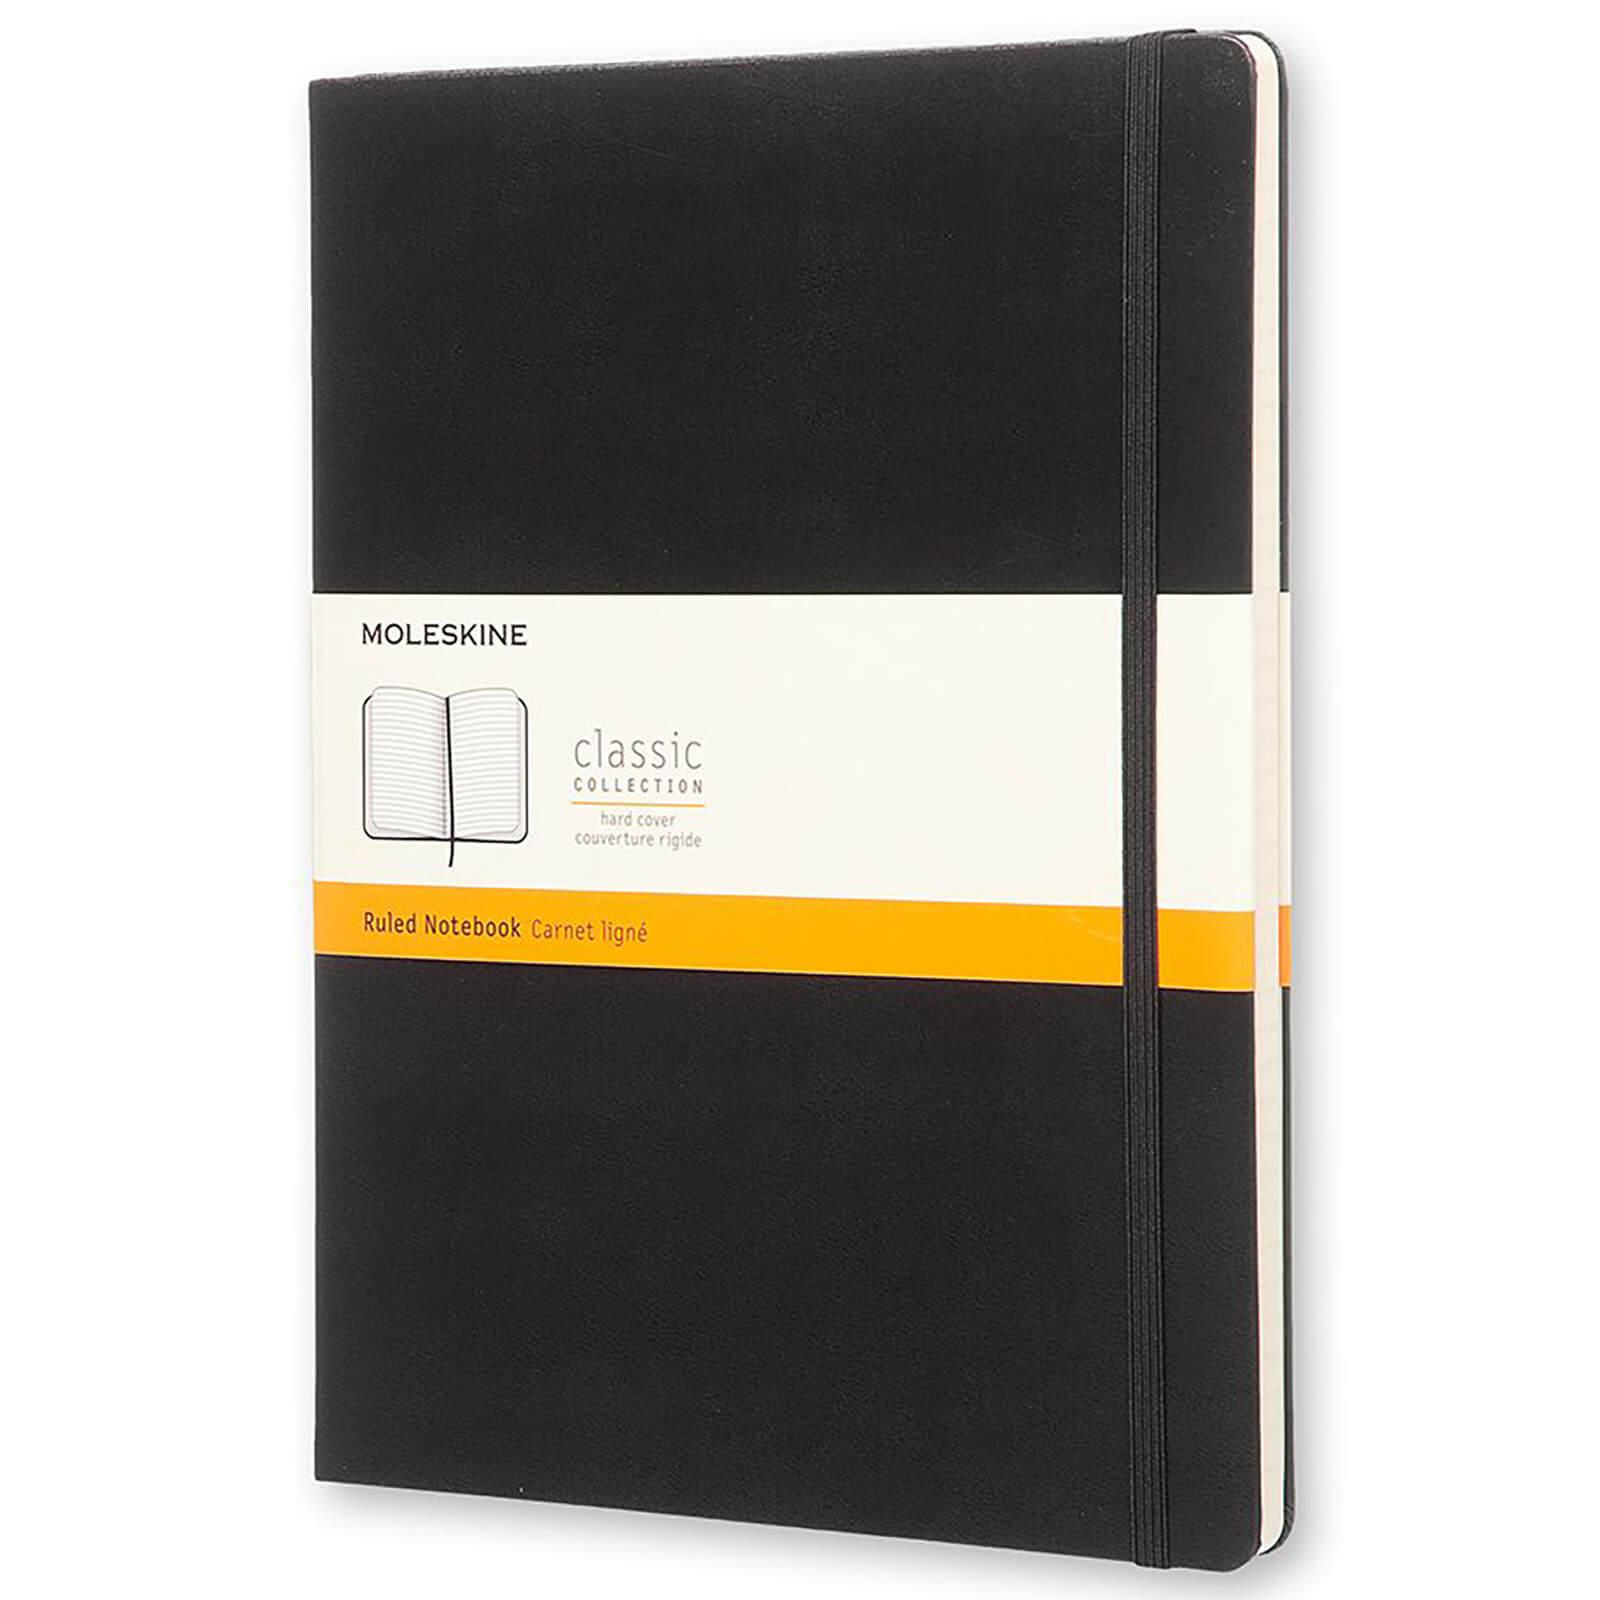 Moleskine Classic Ruled Hardcover XL Notebook - Black